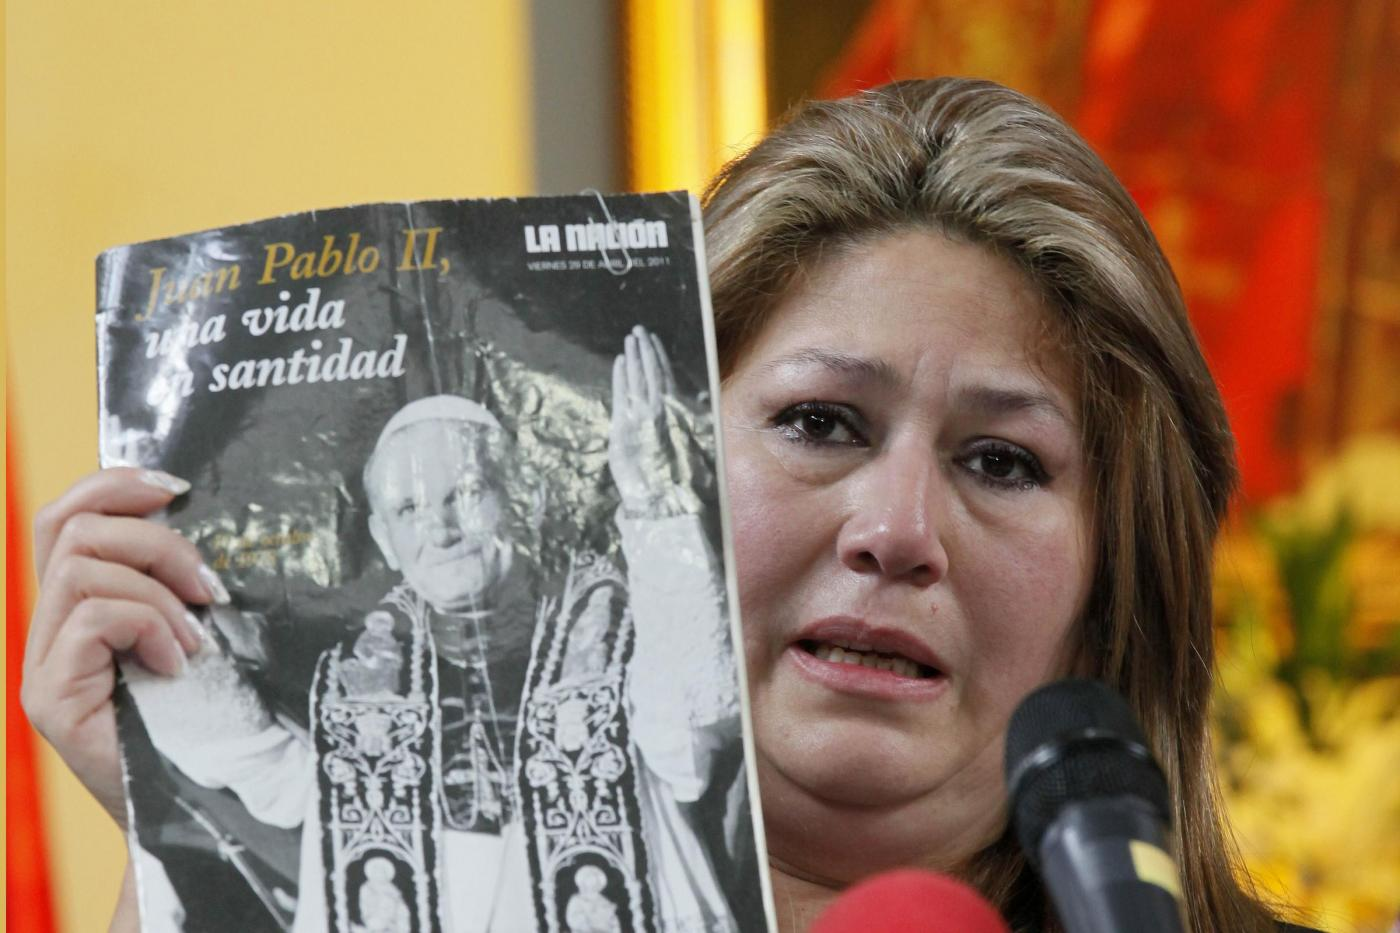 Chi è Floribeth Mora Diaz, la donna miracolata da Wojtyla?